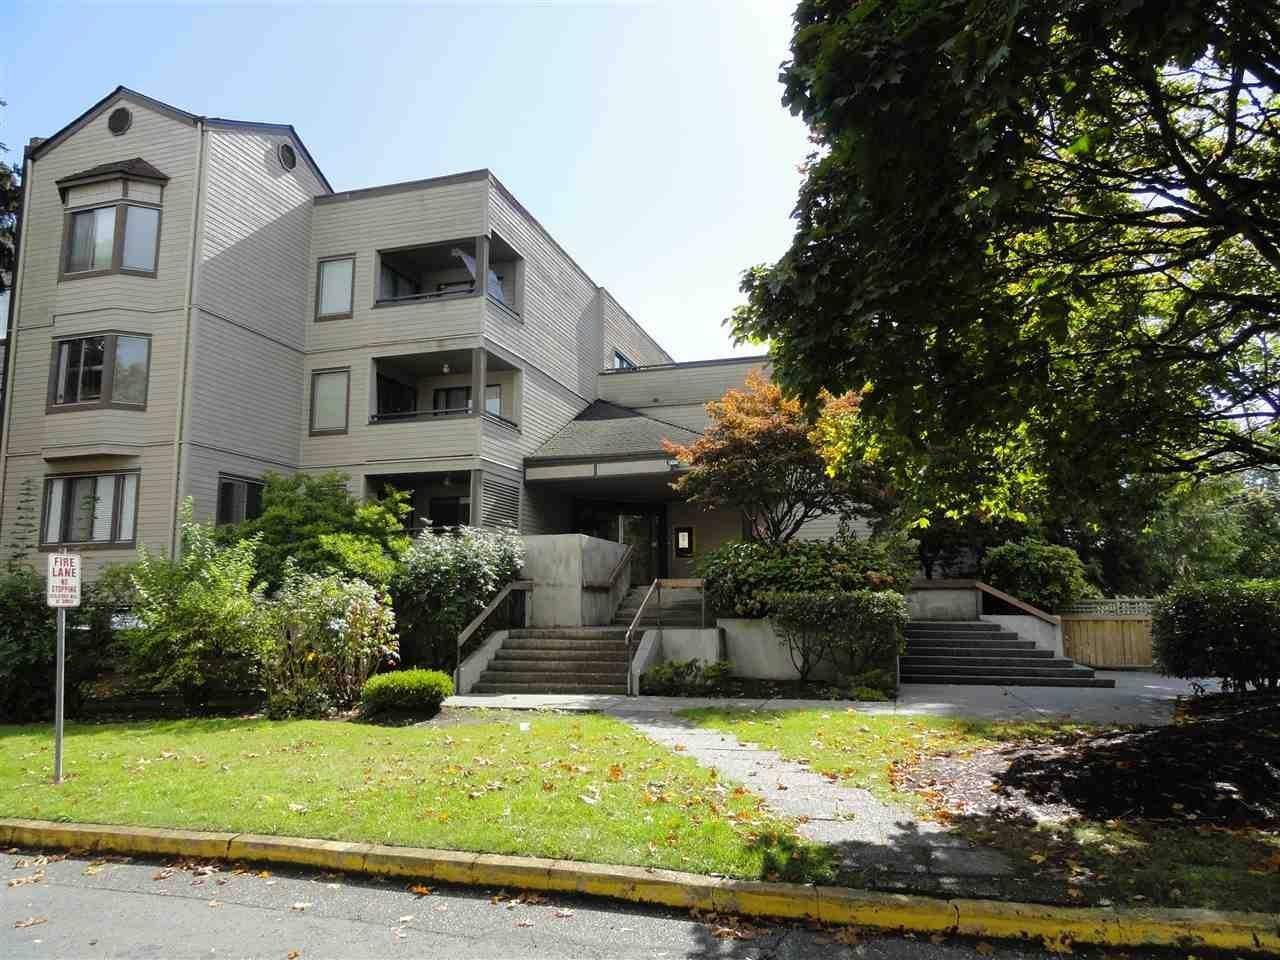 R2110016 - 205 5224 204 STREET, Langley City, Langley, BC - Apartment Unit